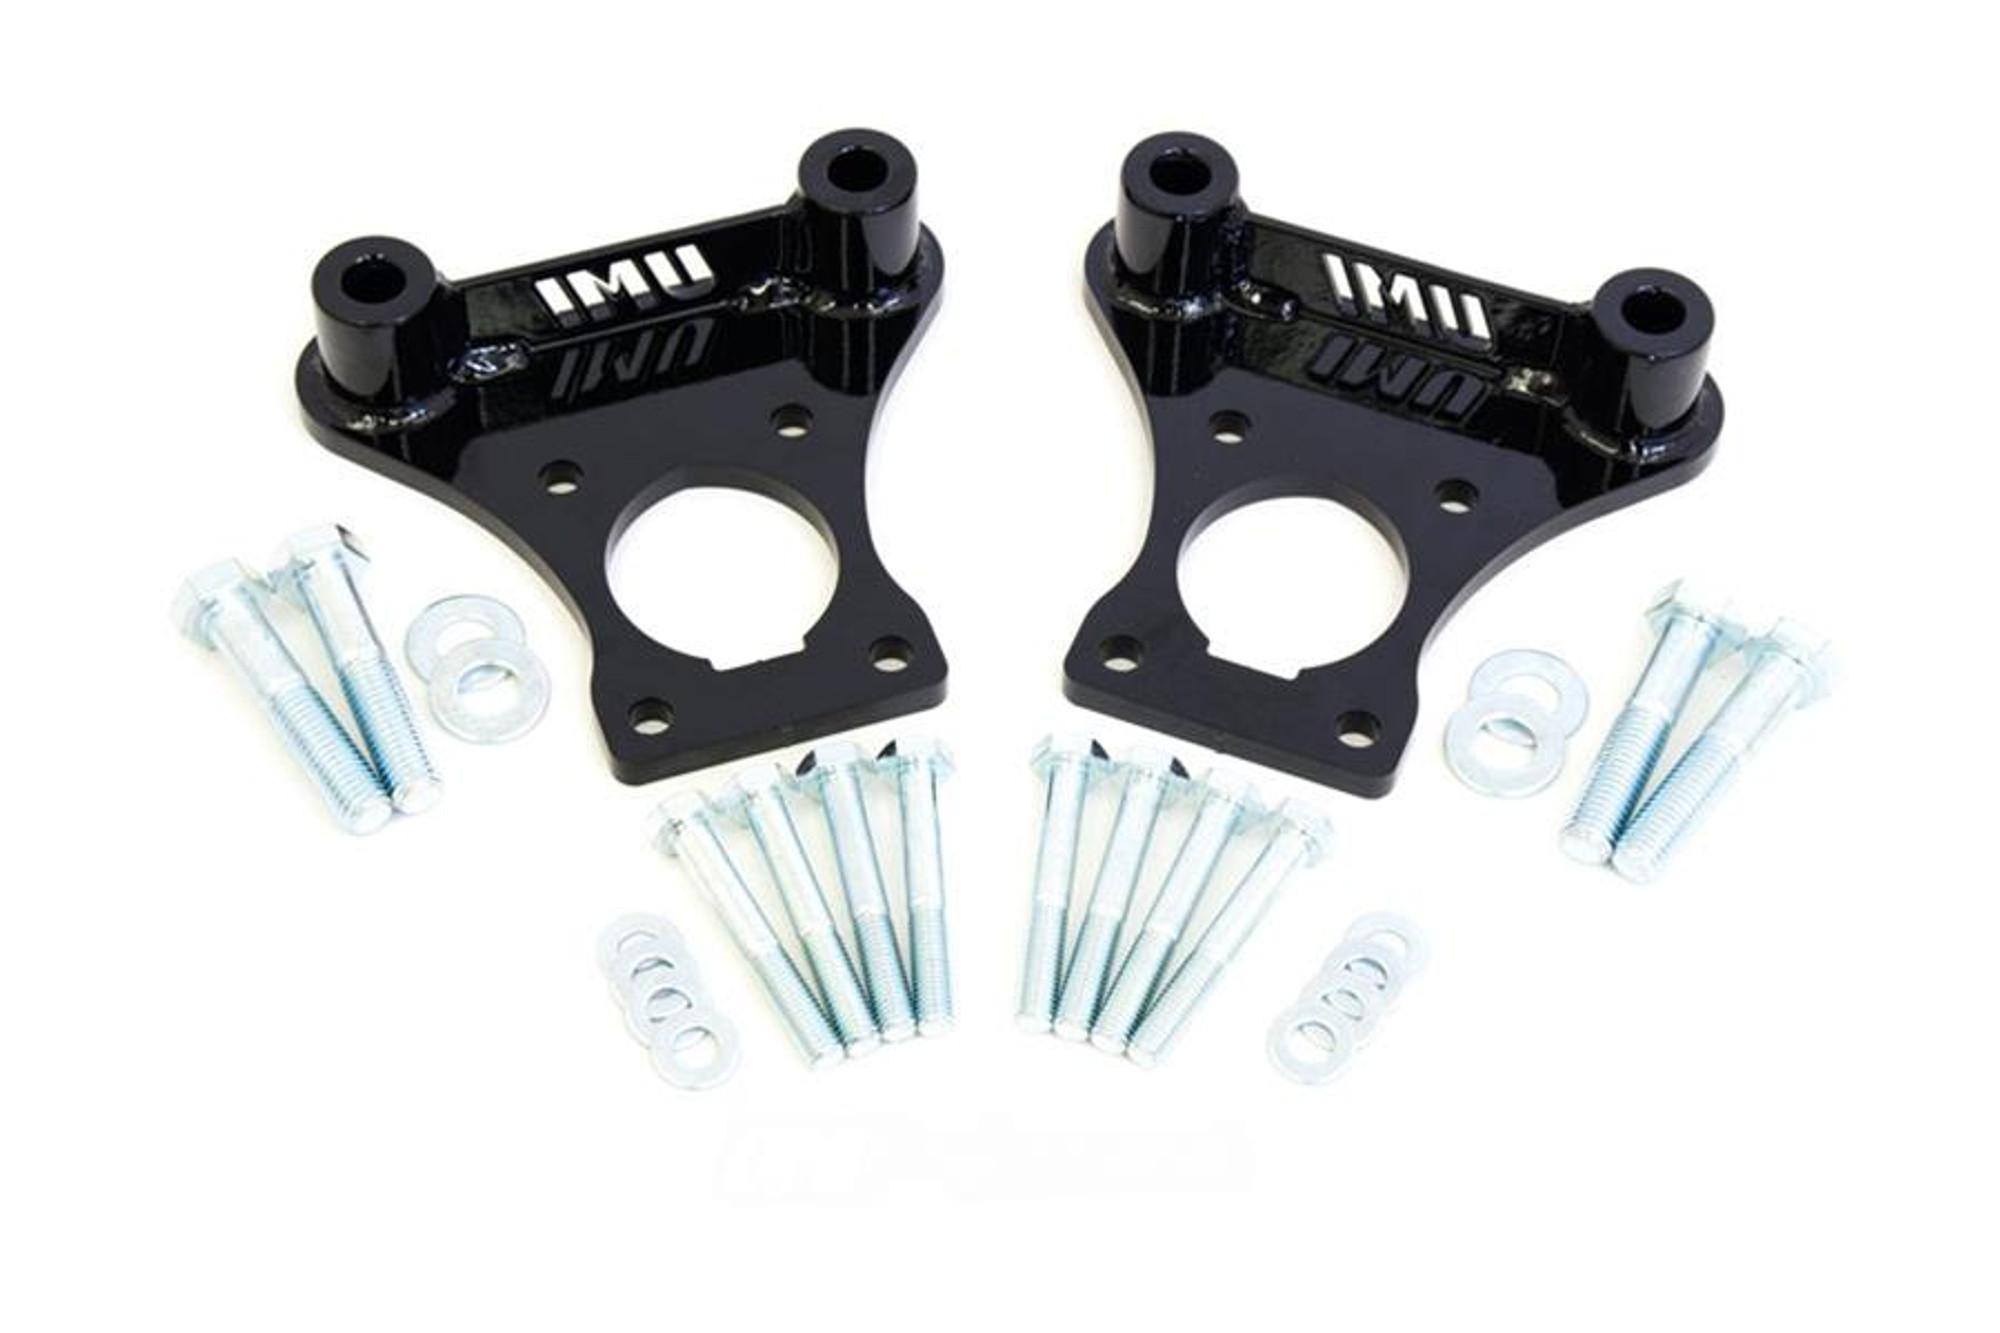 UMI Performance 1993-2002 Camaro, Firebird, & Trans Am C5/C6 Brake  Conversion Brackets